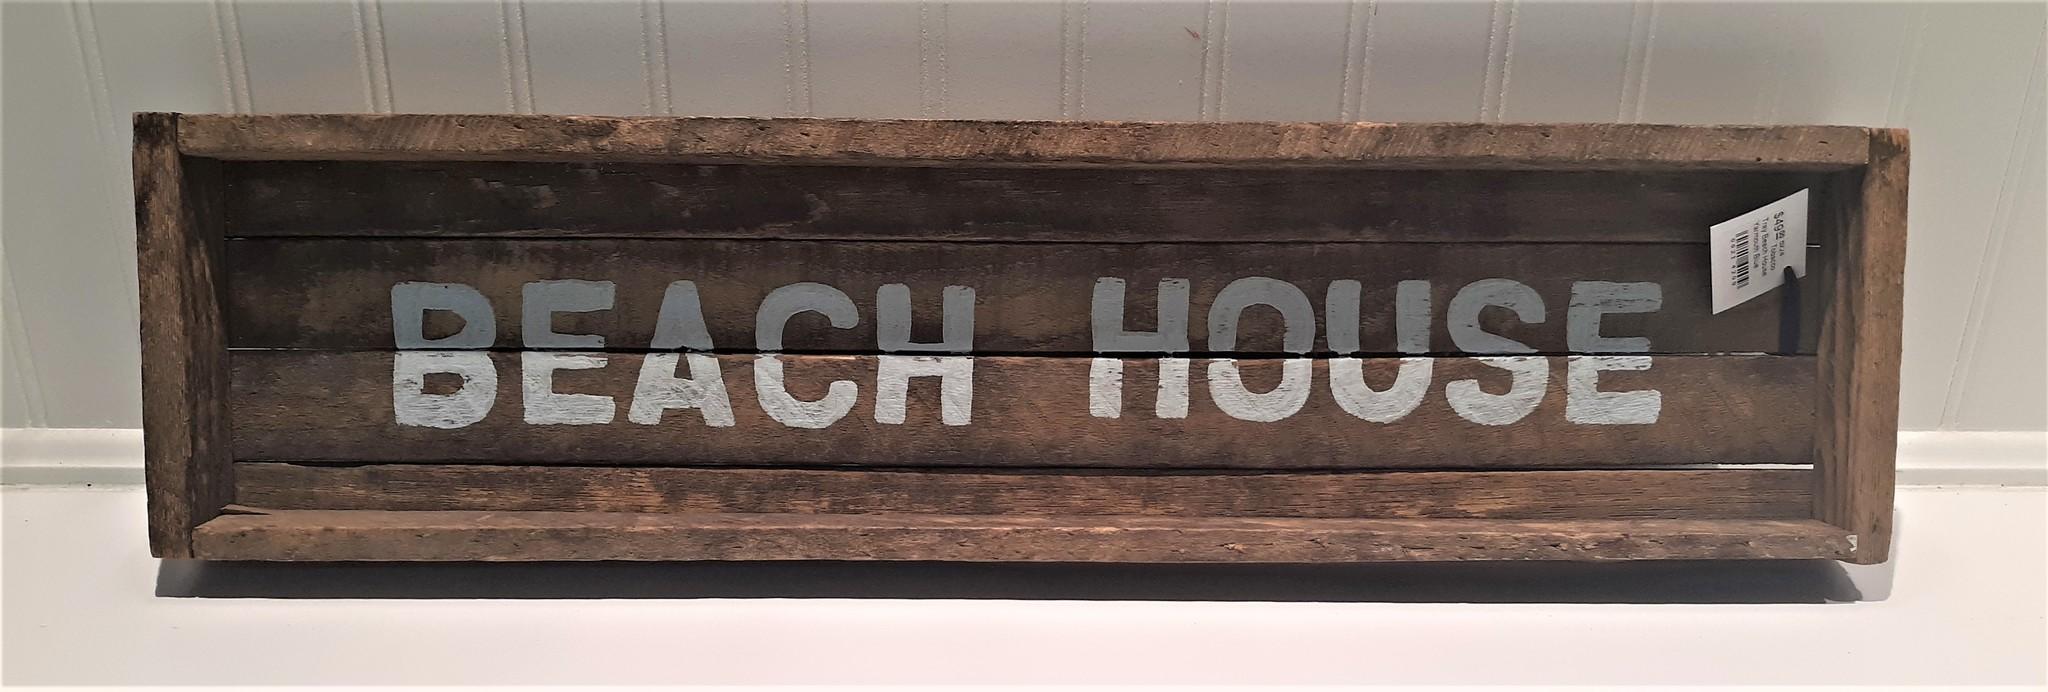 6x24 Tobacco Tray Beach House Yarmouth Blue